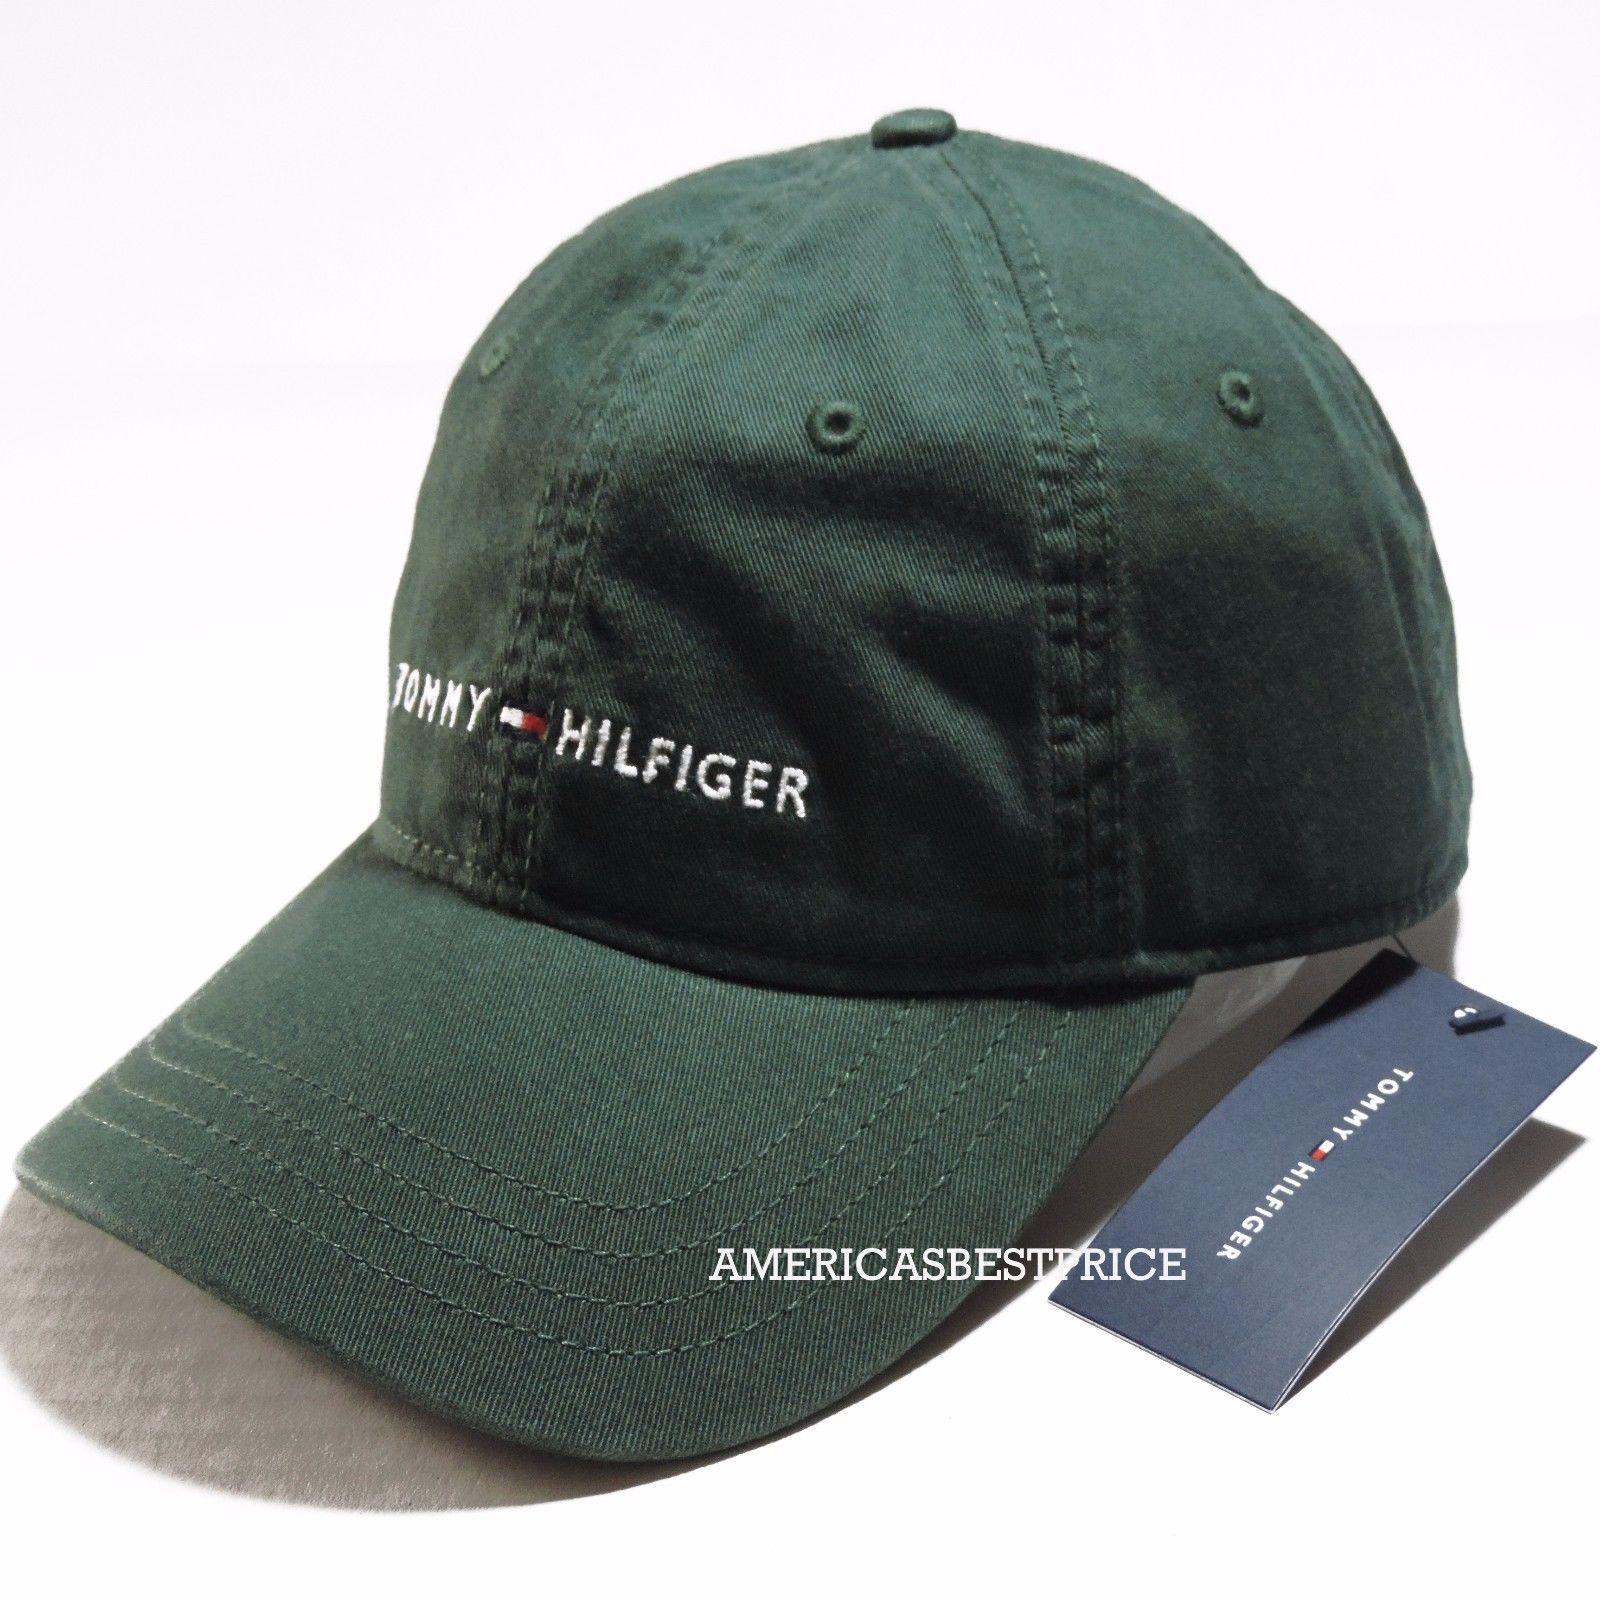 4ce97a917 Details about TOMMY HILFIGER NEW MEN'S BASEBALL CAP/HAT BLUE NAVY ...